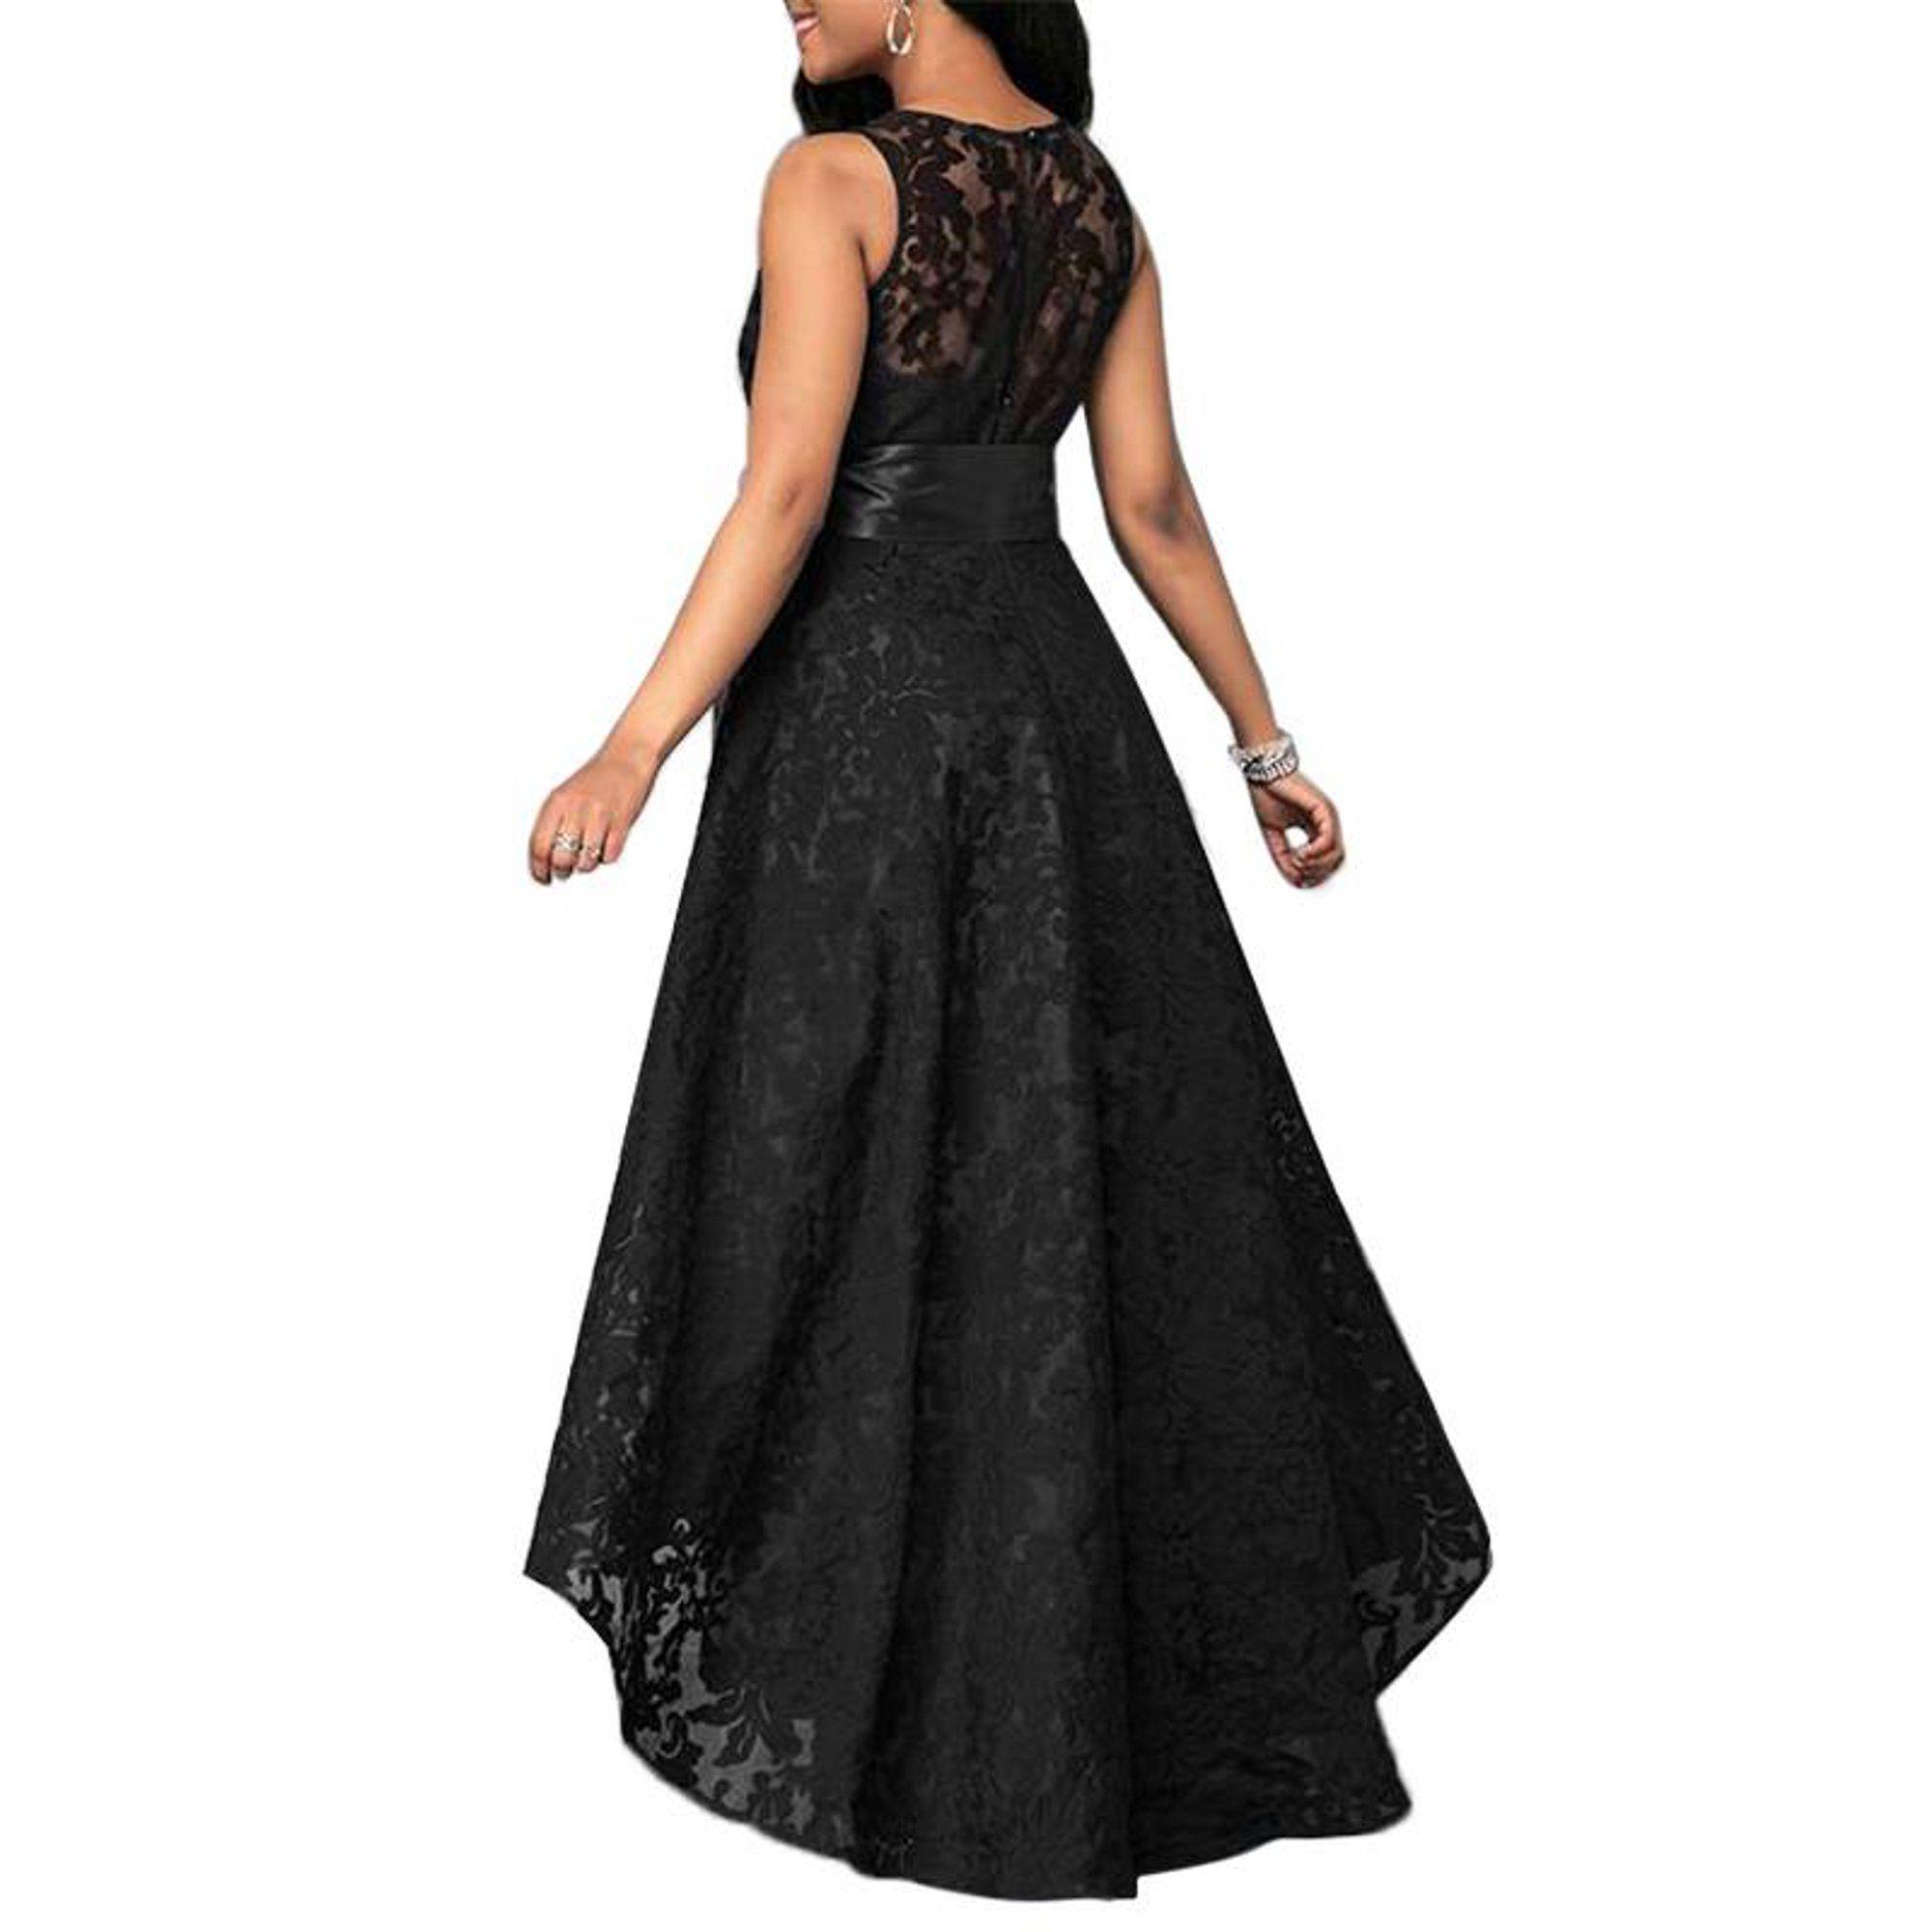 Justvh Justvh Women S Formal Floral Lace Sleeveless High Low Evening Party Maxi Dress Walmart Com Maxi Dress Party Plus Size Wedding Guest Dresses Dresses [ 2000 x 2000 Pixel ]